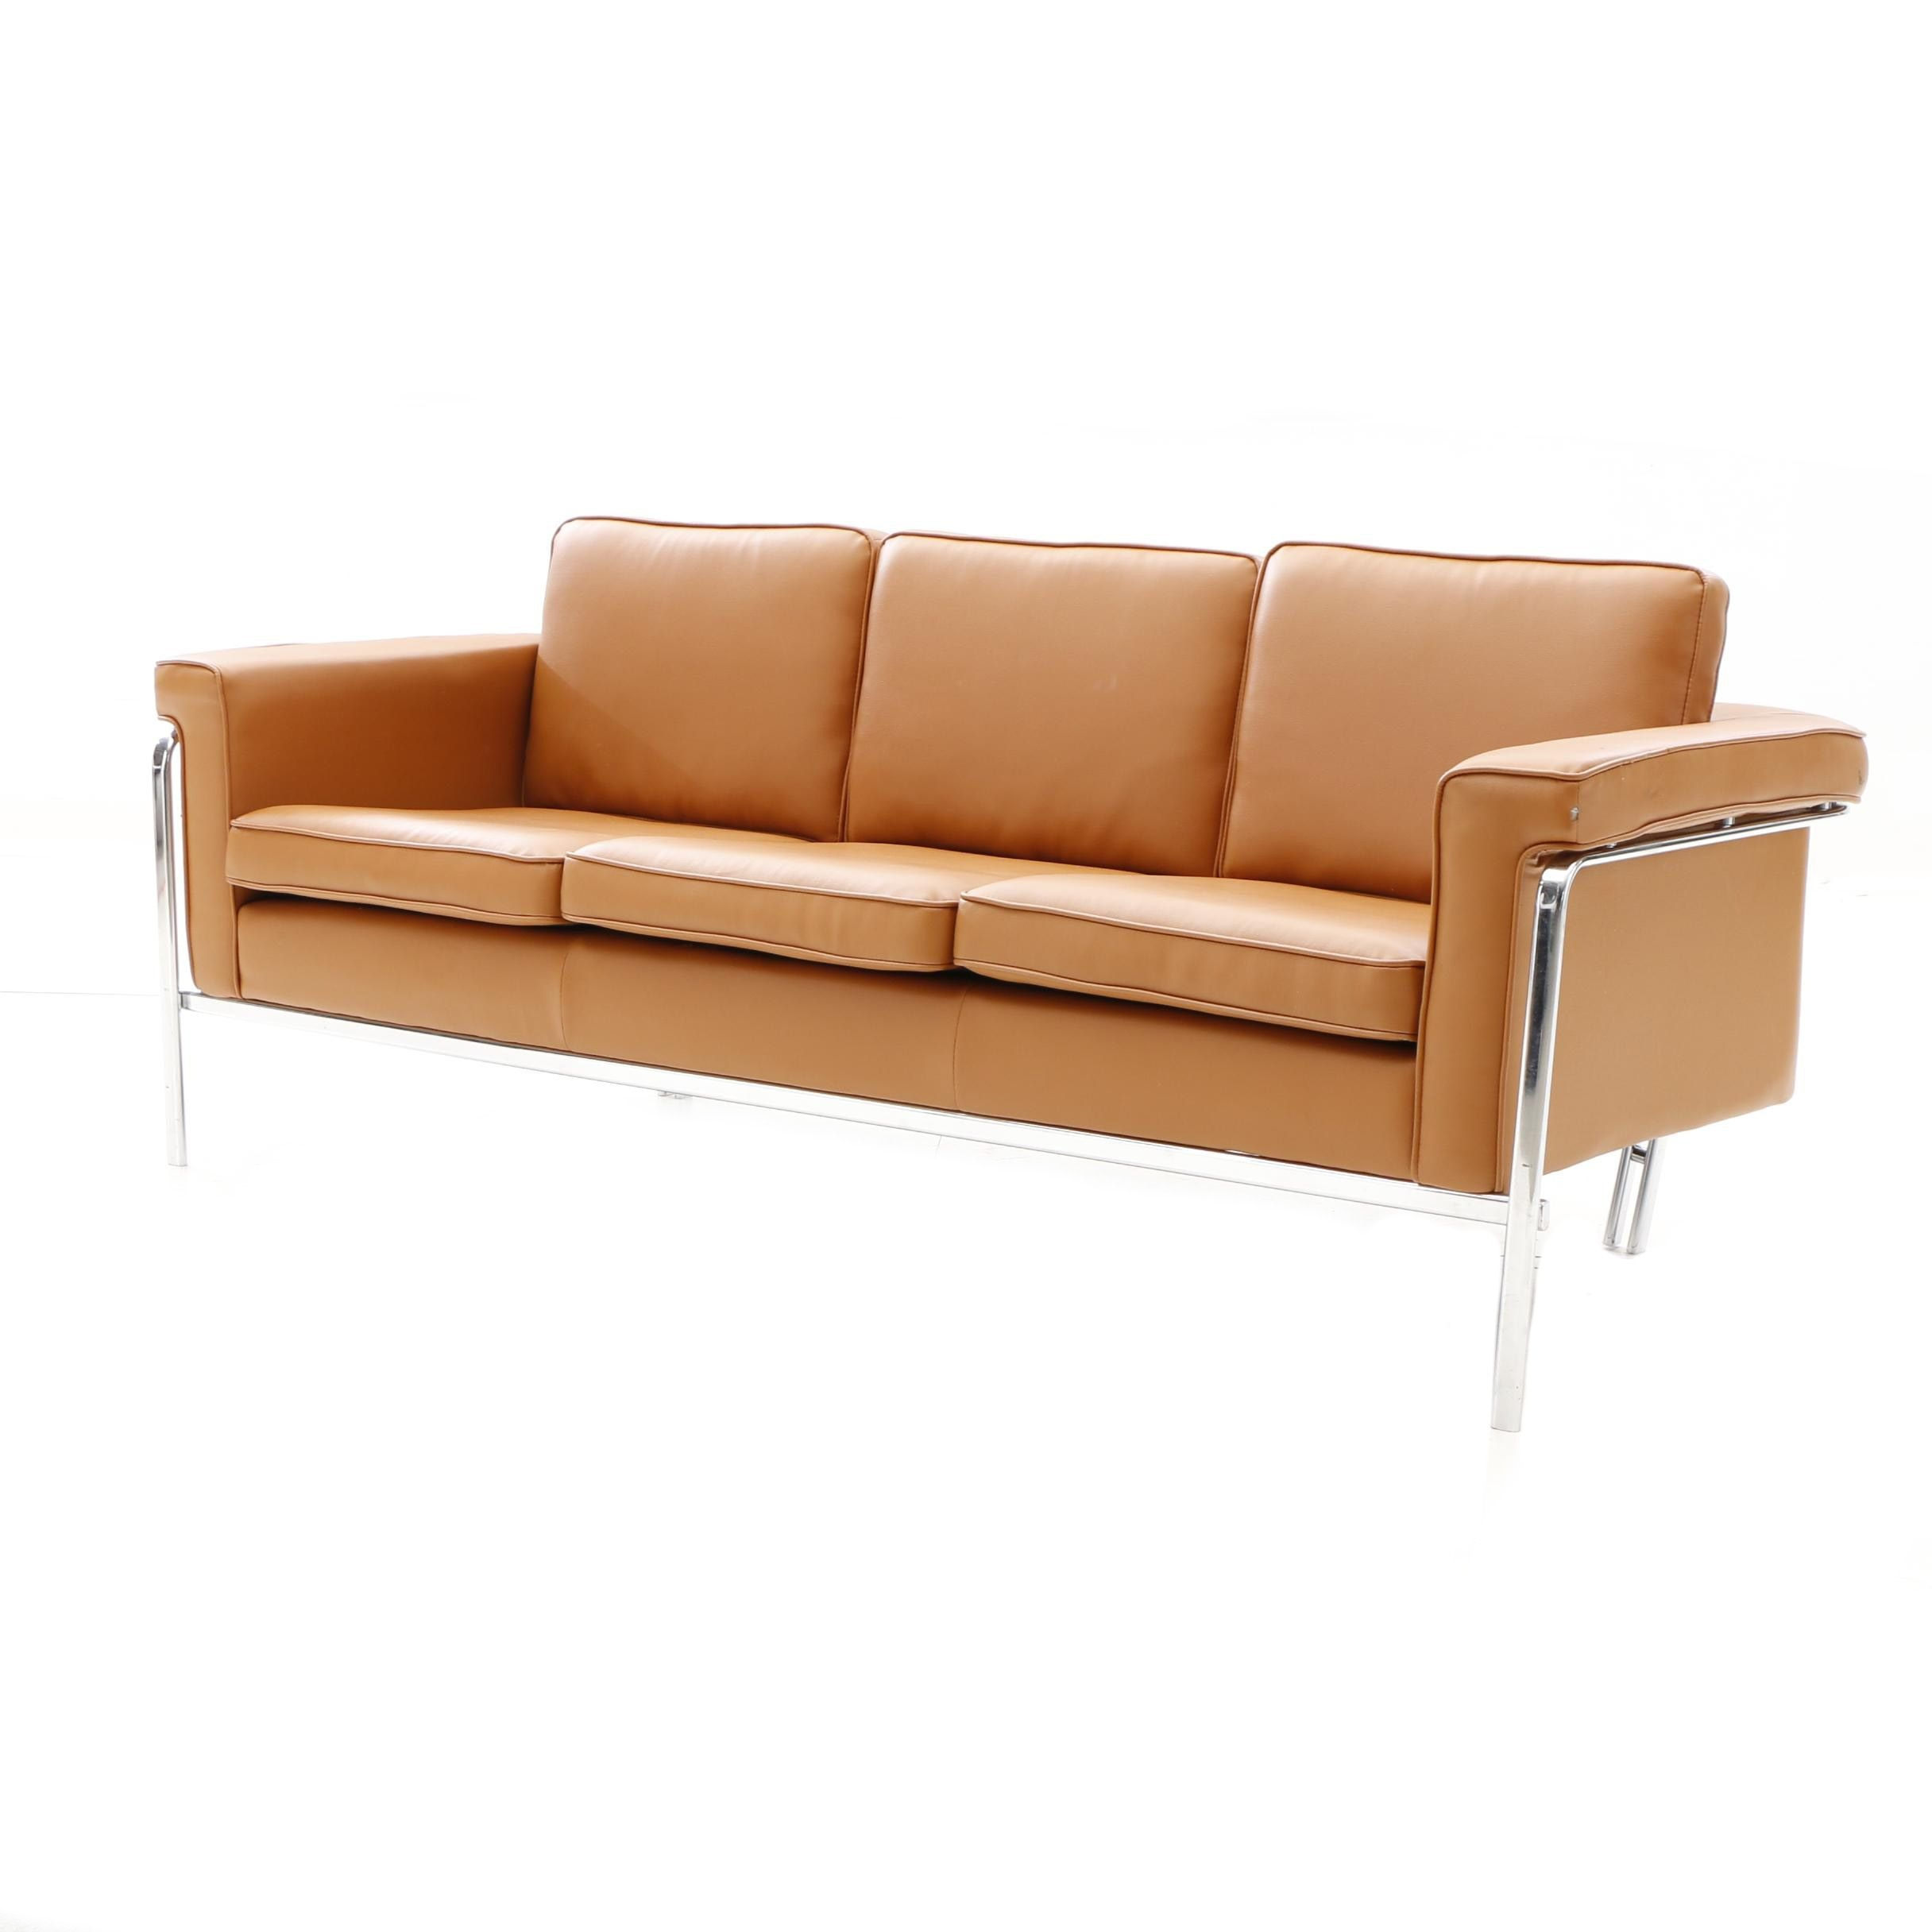 "Modern ""Singular"" Sofa by Zuo Mod"